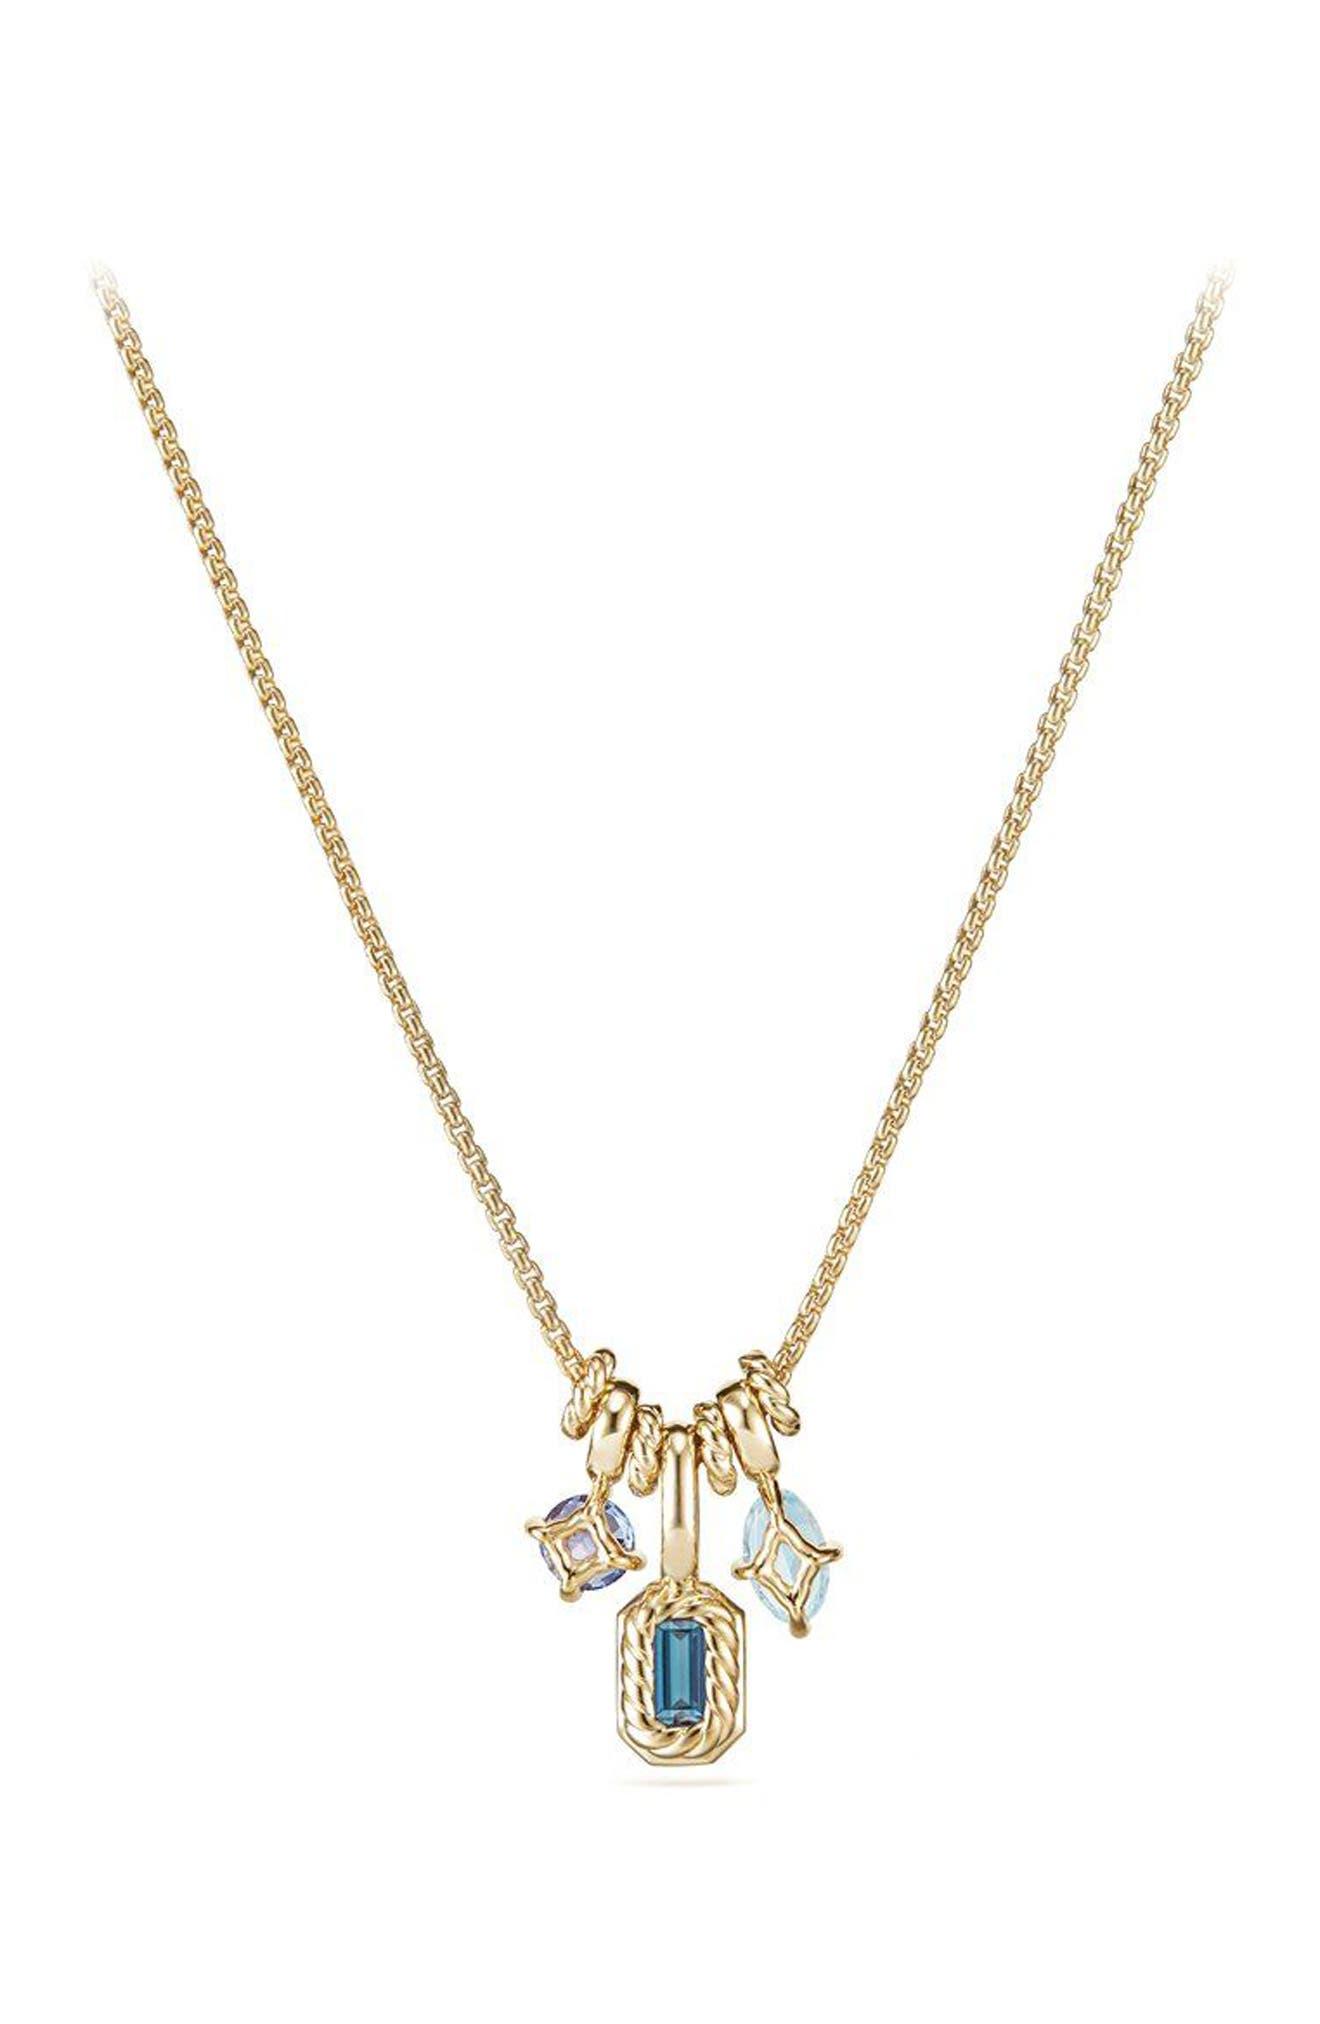 Novella Pendant Necklace in 18K Gold,                             Alternate thumbnail 3, color,                             GOLD/ BLUE TOPAZ/ AQUAMARINE